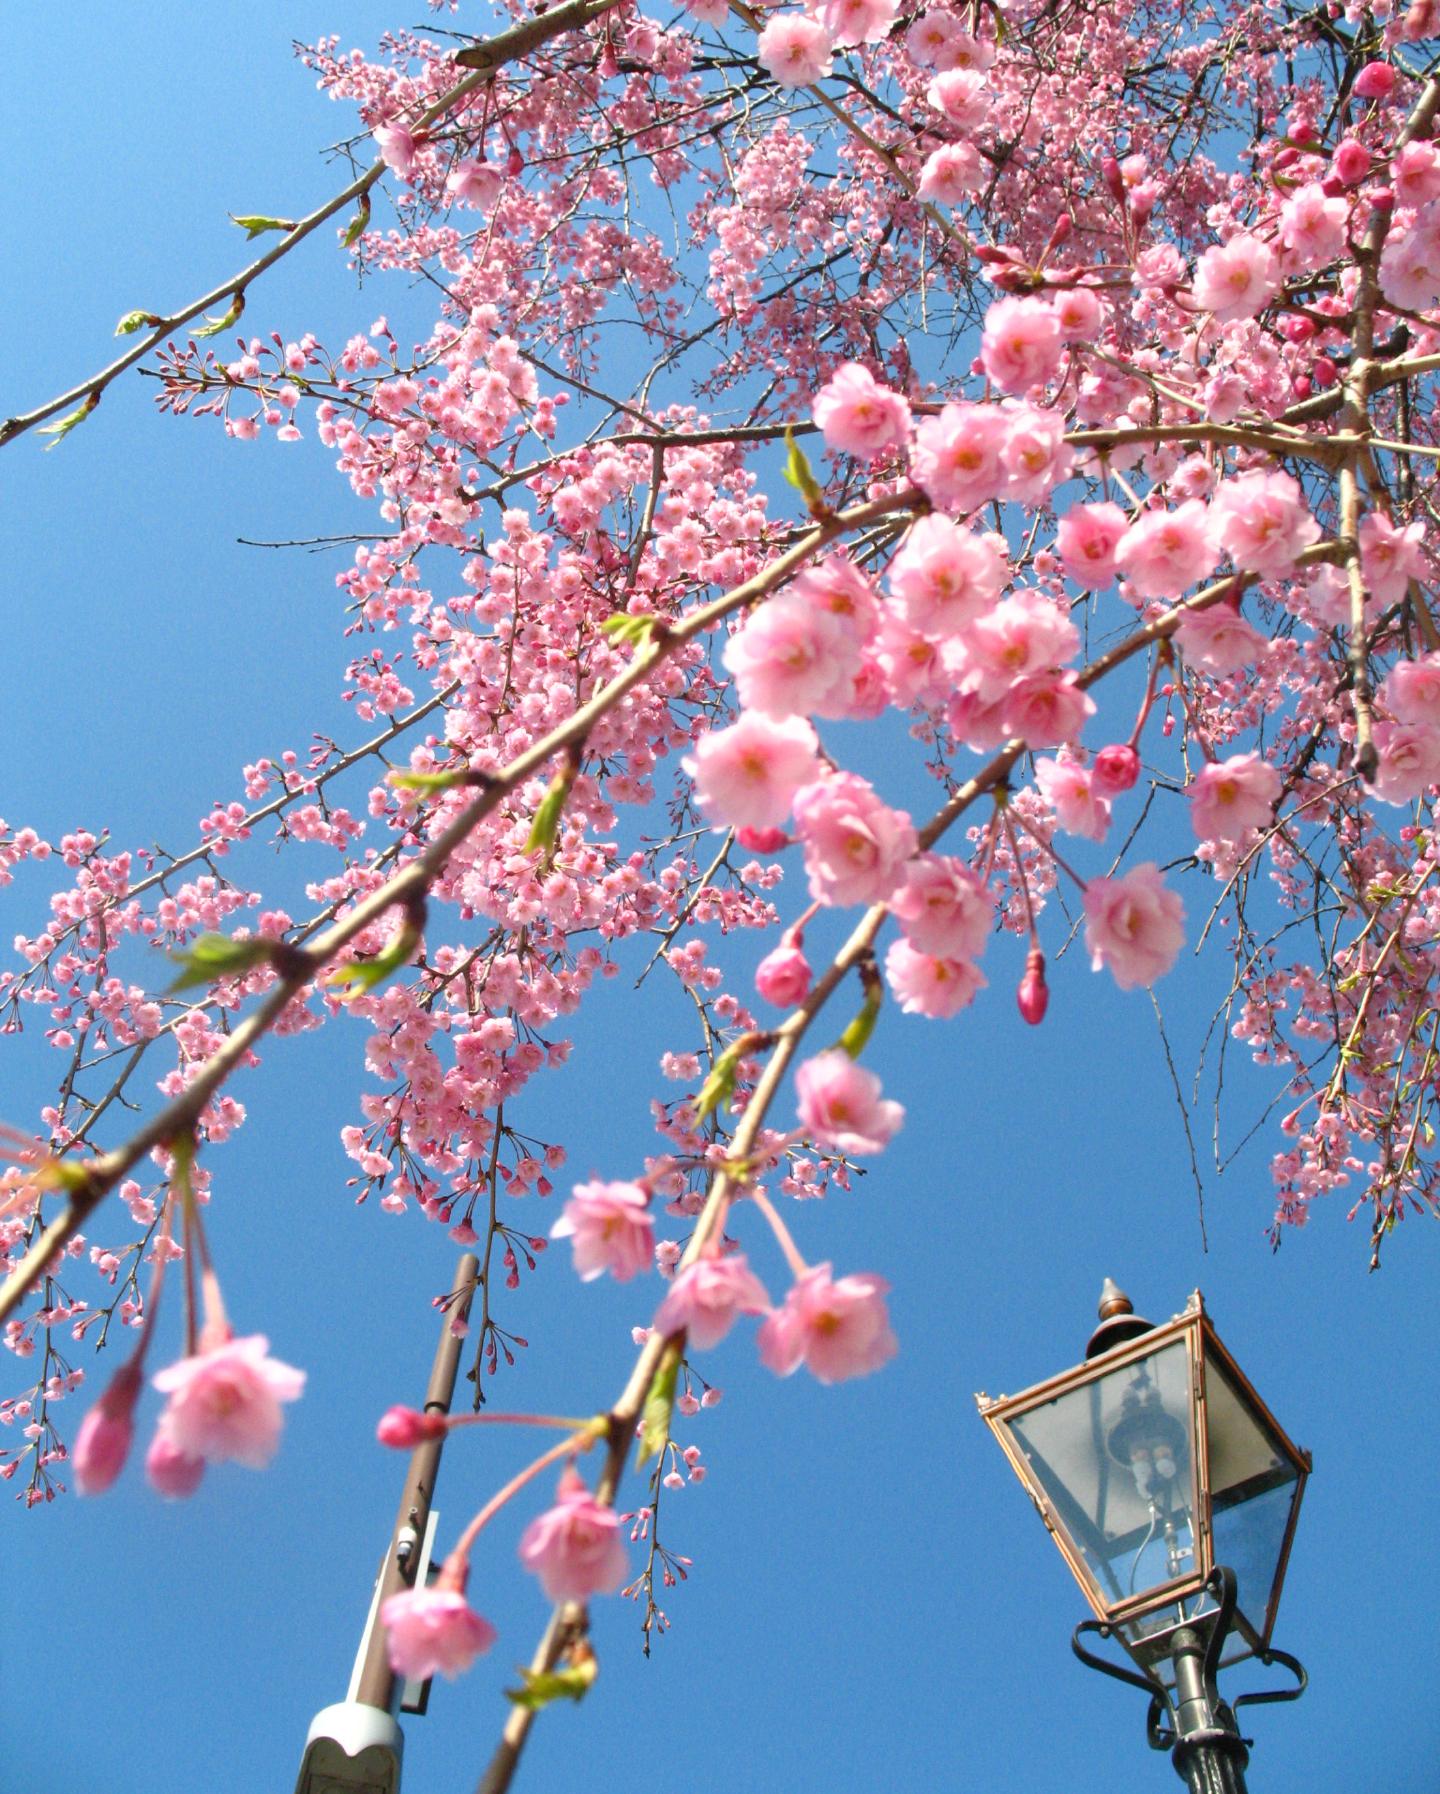 Sakura blossoms in Japan